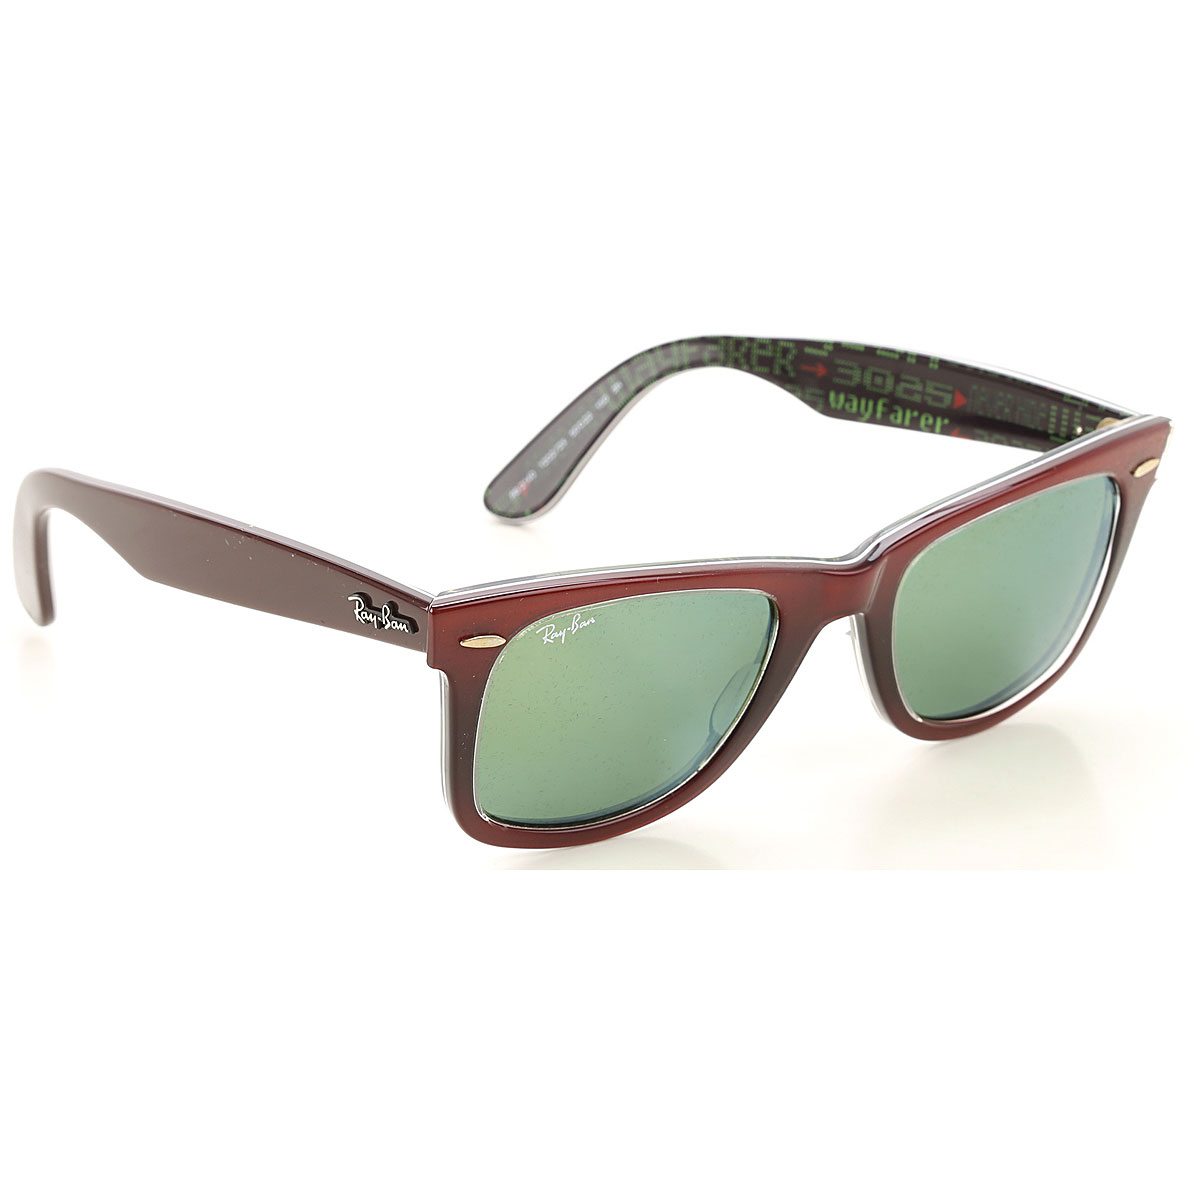 Ray Ban Sunglasses On Sale, Burgundy Shaded, 2019